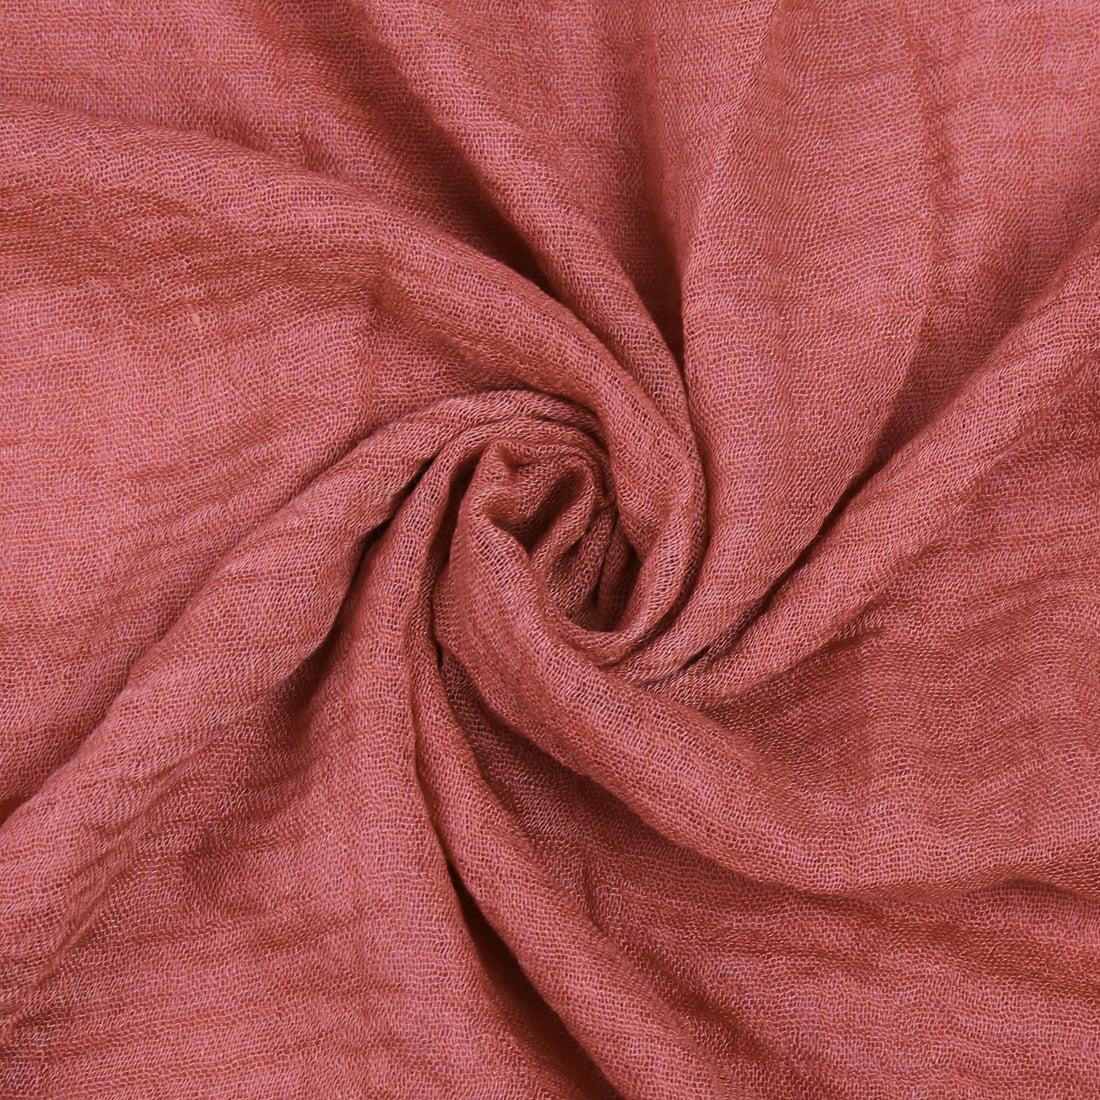 Unisex Cotton Linen Soft Fashion Long Scarf Hijab Wrap Shawl Headwear Scarves #3 - image 1 de 3